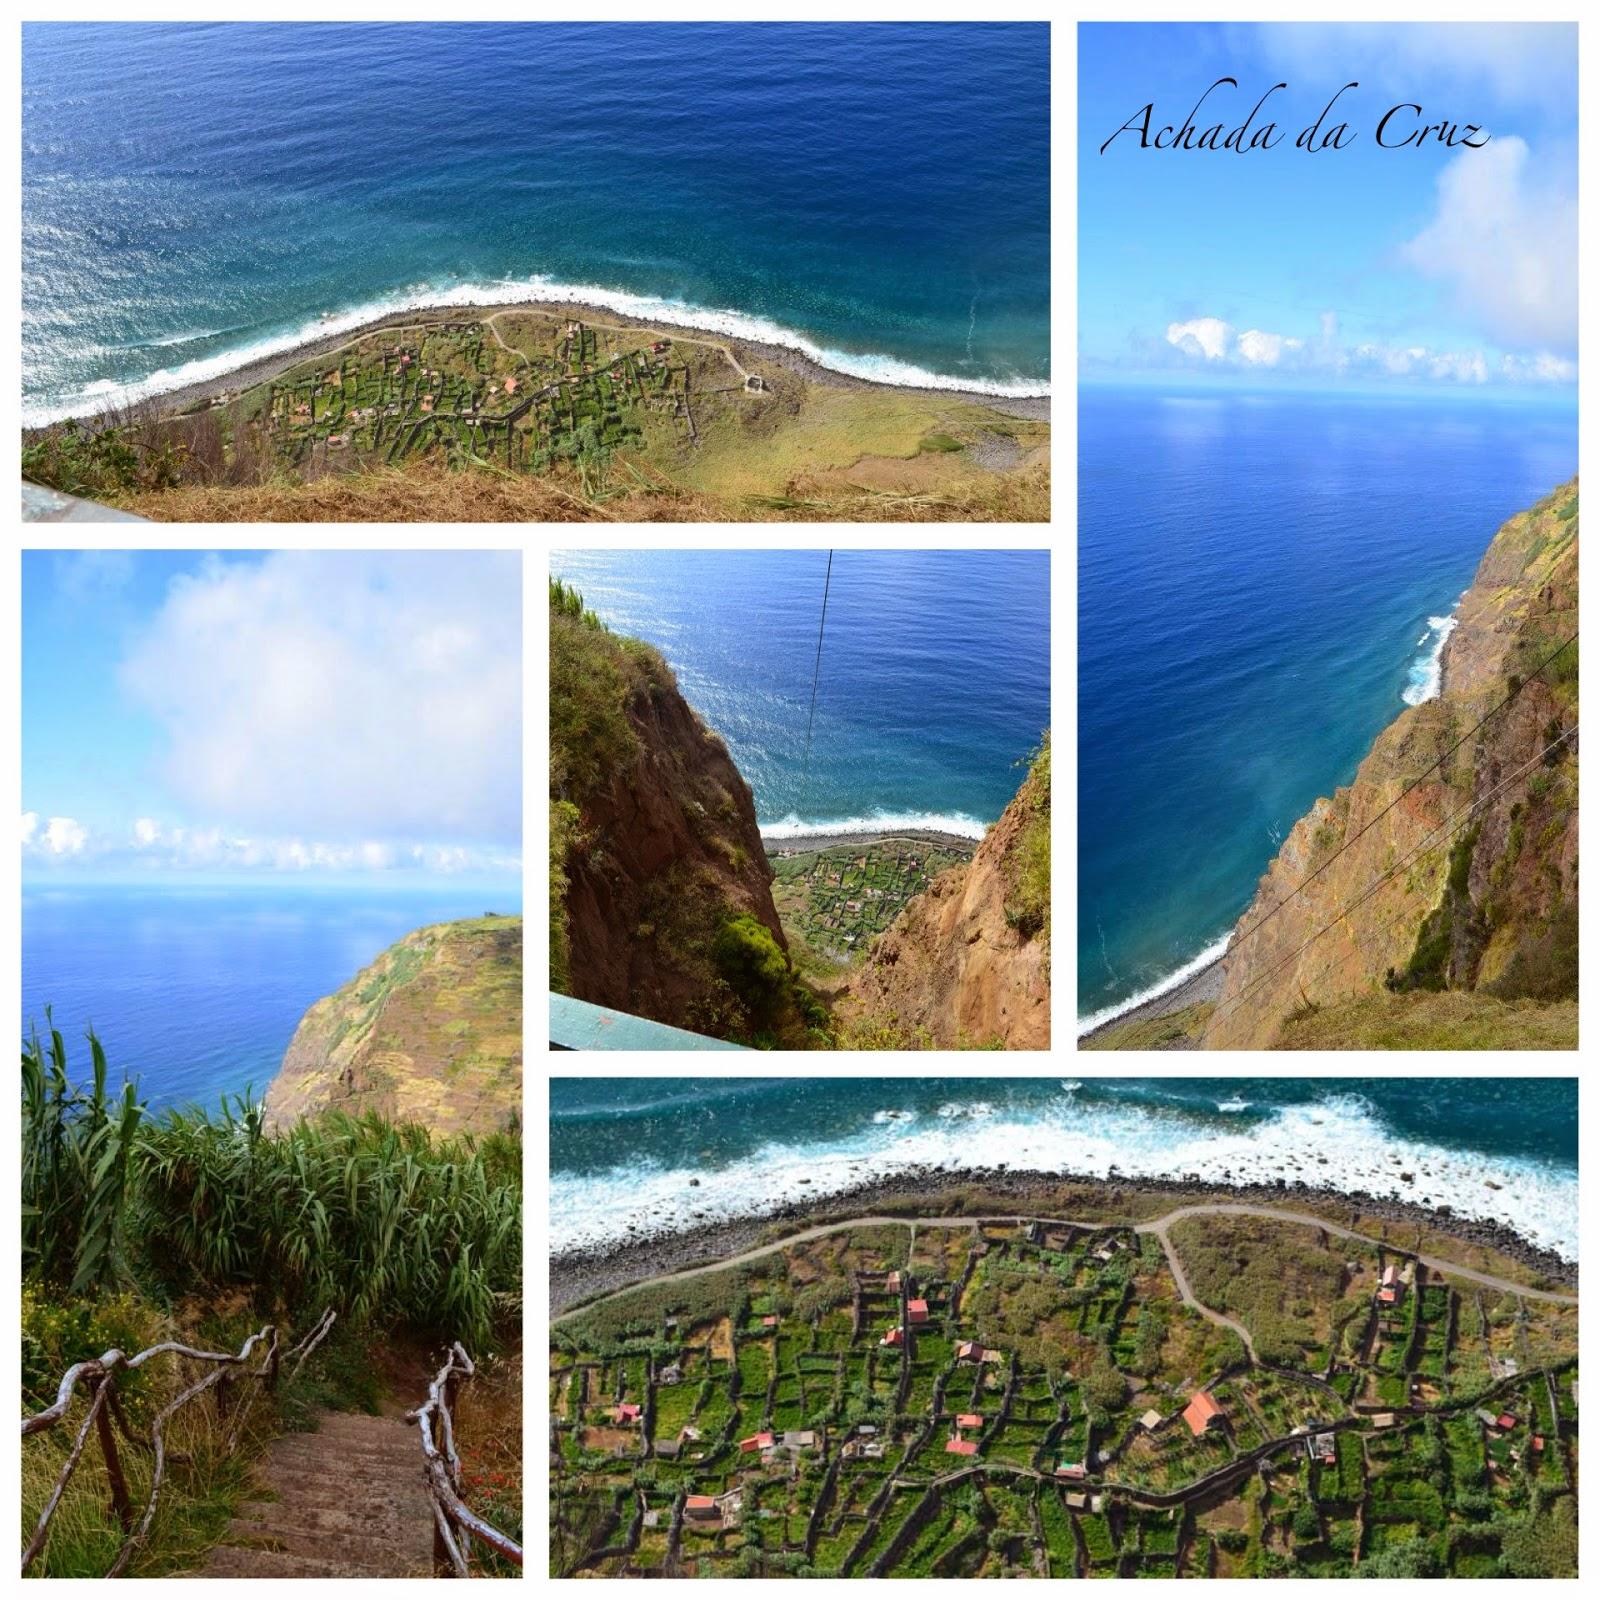 Madeira, Achada da Cruz